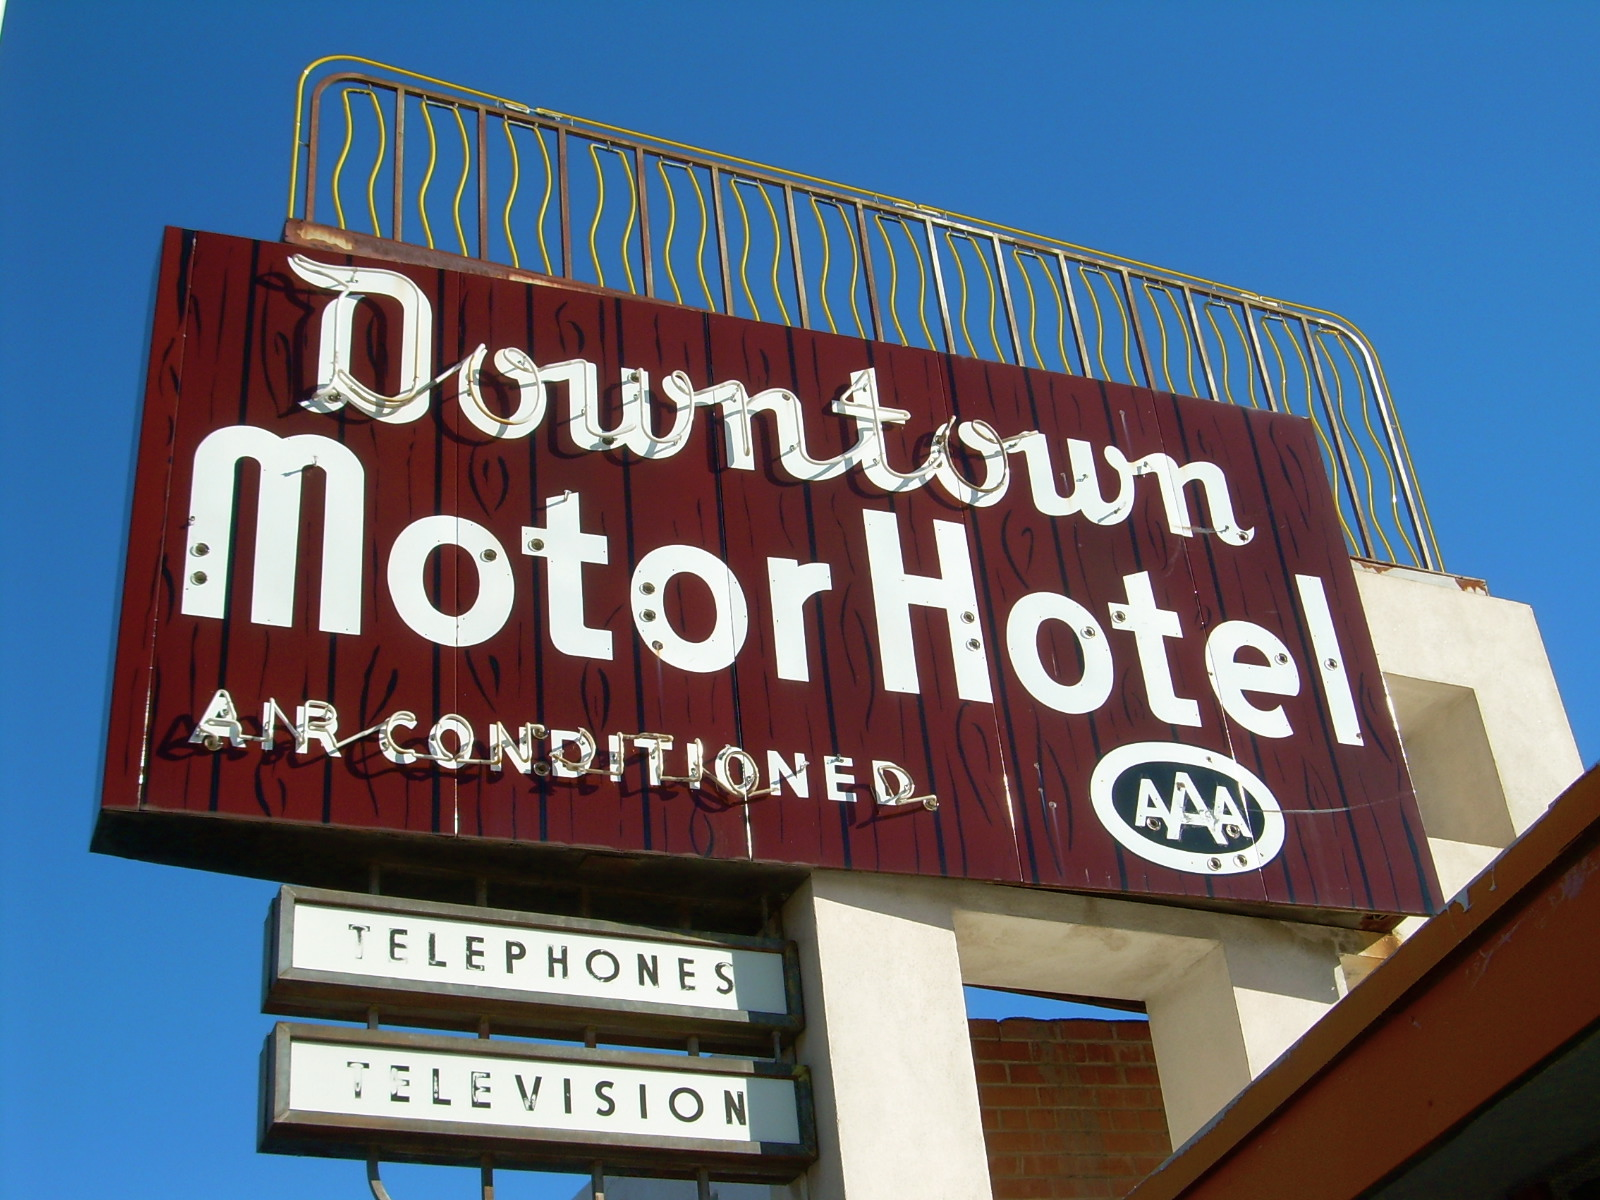 Downtown Motor Hotel - Tucson, Arizona U.S.A. - March 16, 2008